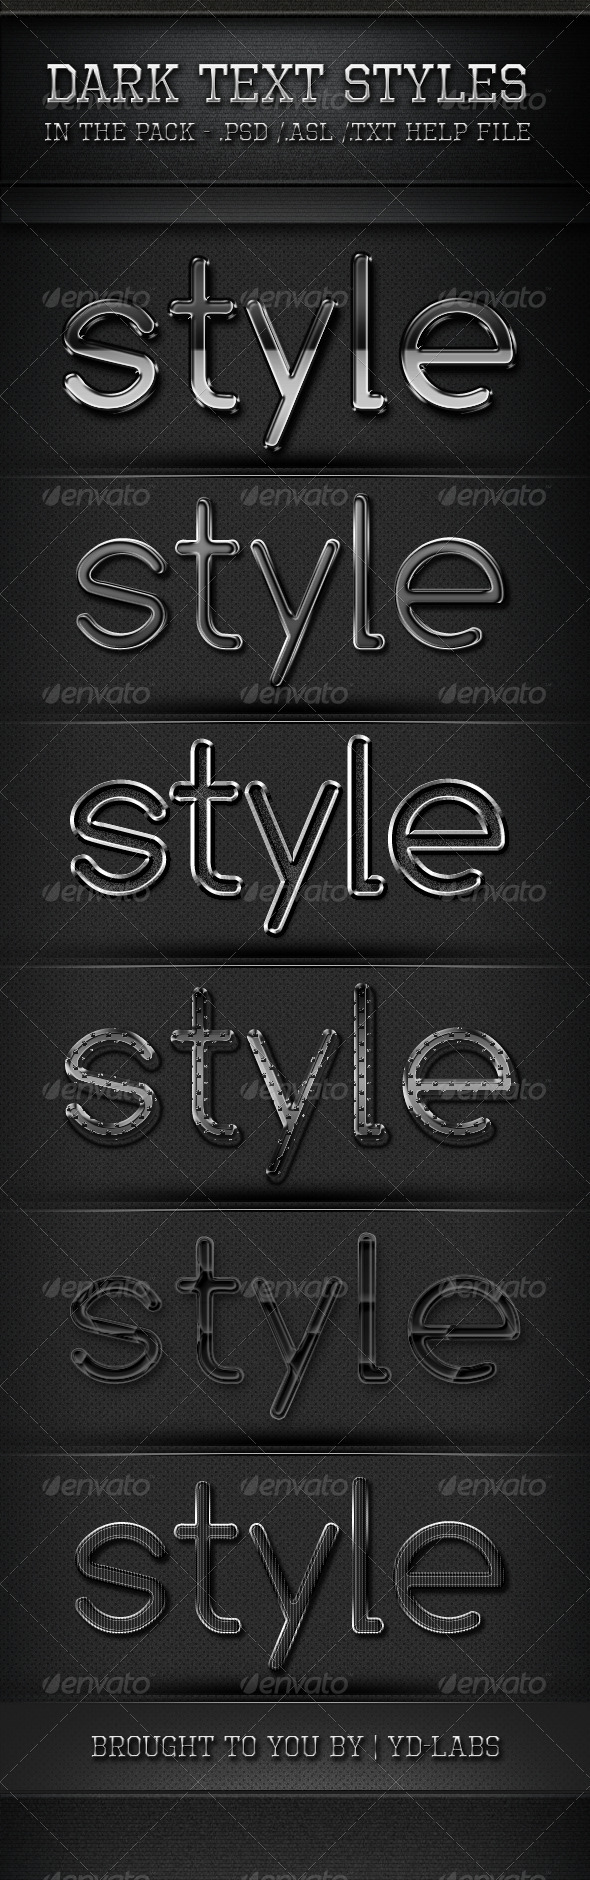 Dark Text Styles Text Style Style Photoshop Styles